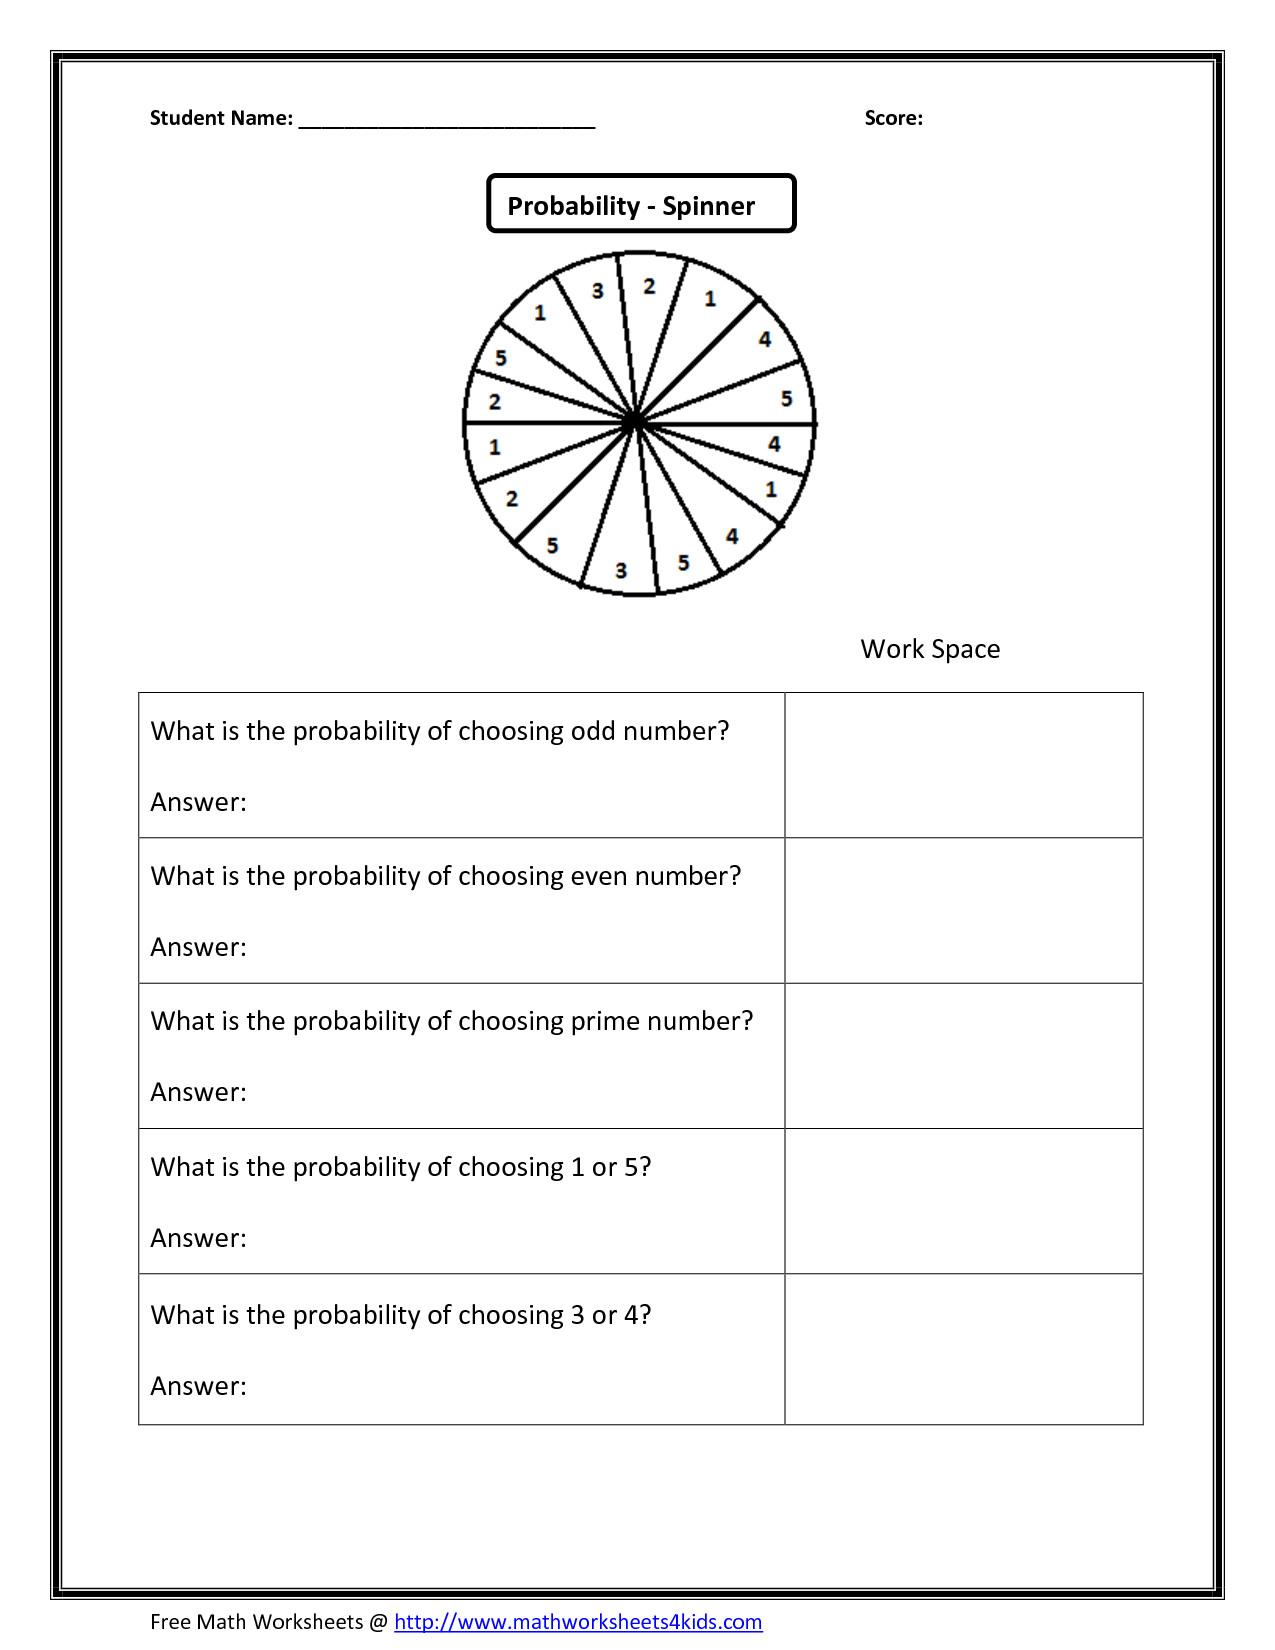 8Th Grade Math Probability Worksheets Printable Worksheet ...